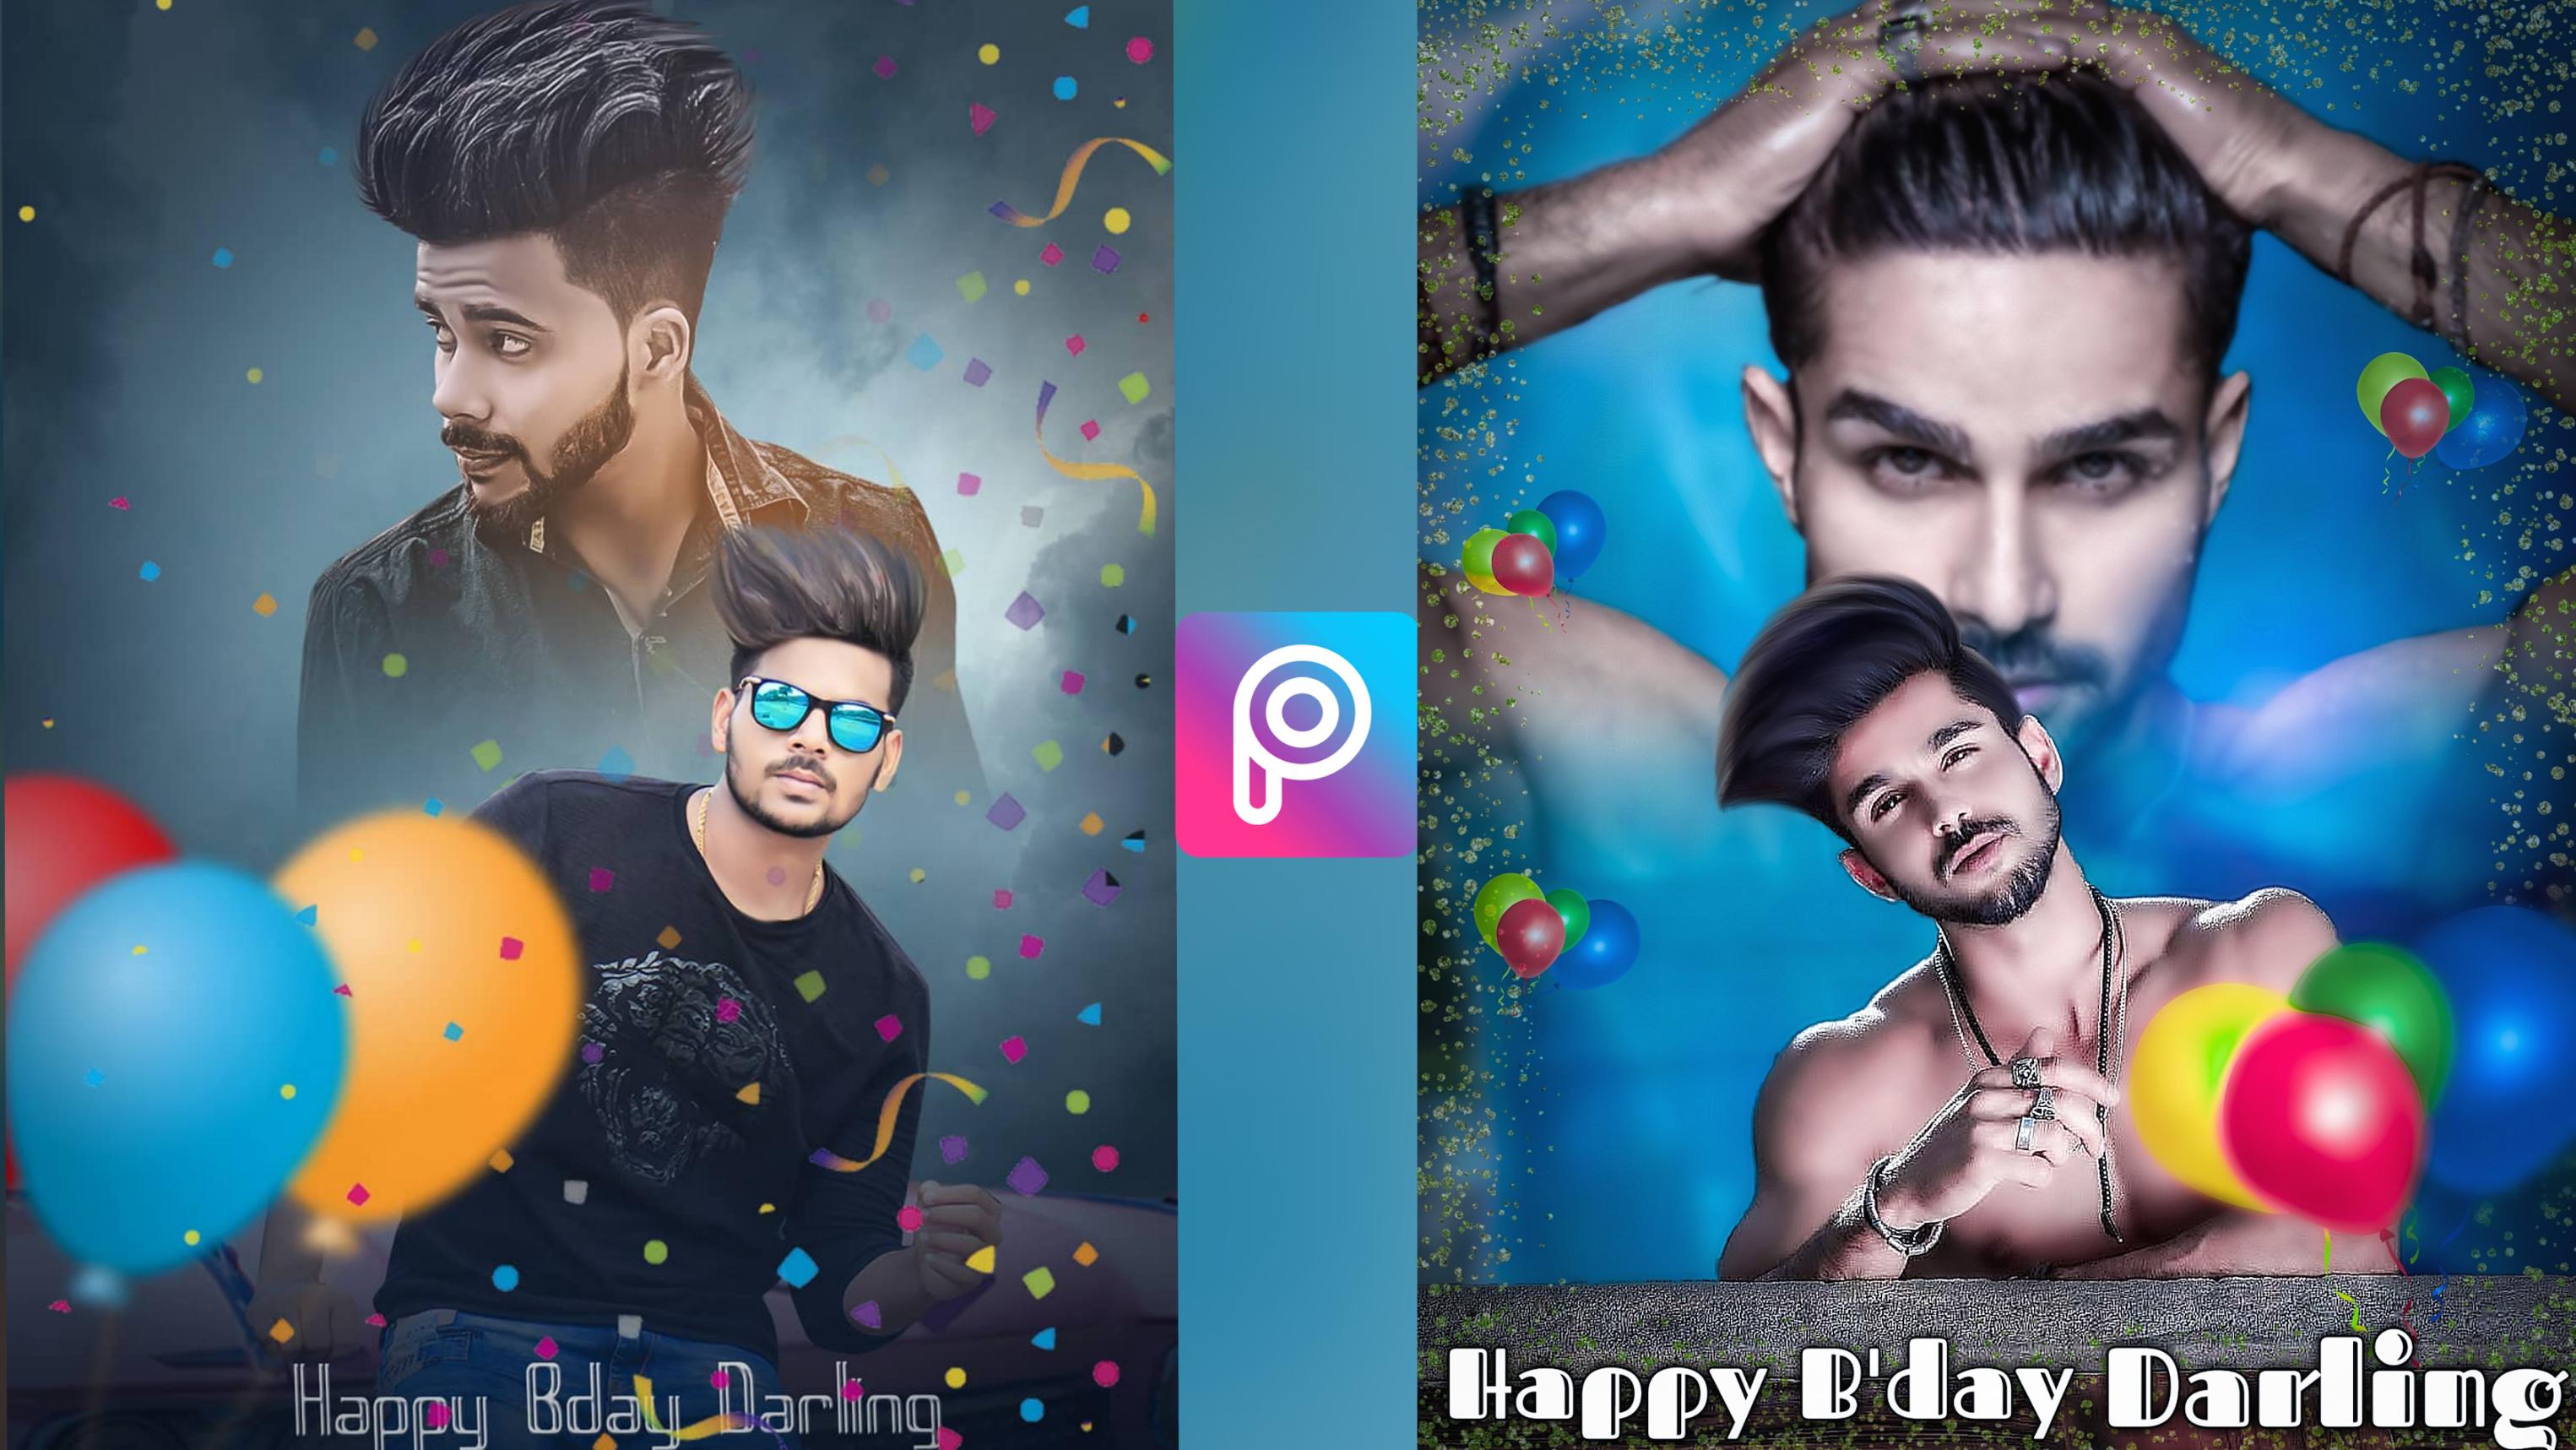 Happy Birthday Photo Editing In PicsArt Like Photoshop By JB EDITZ